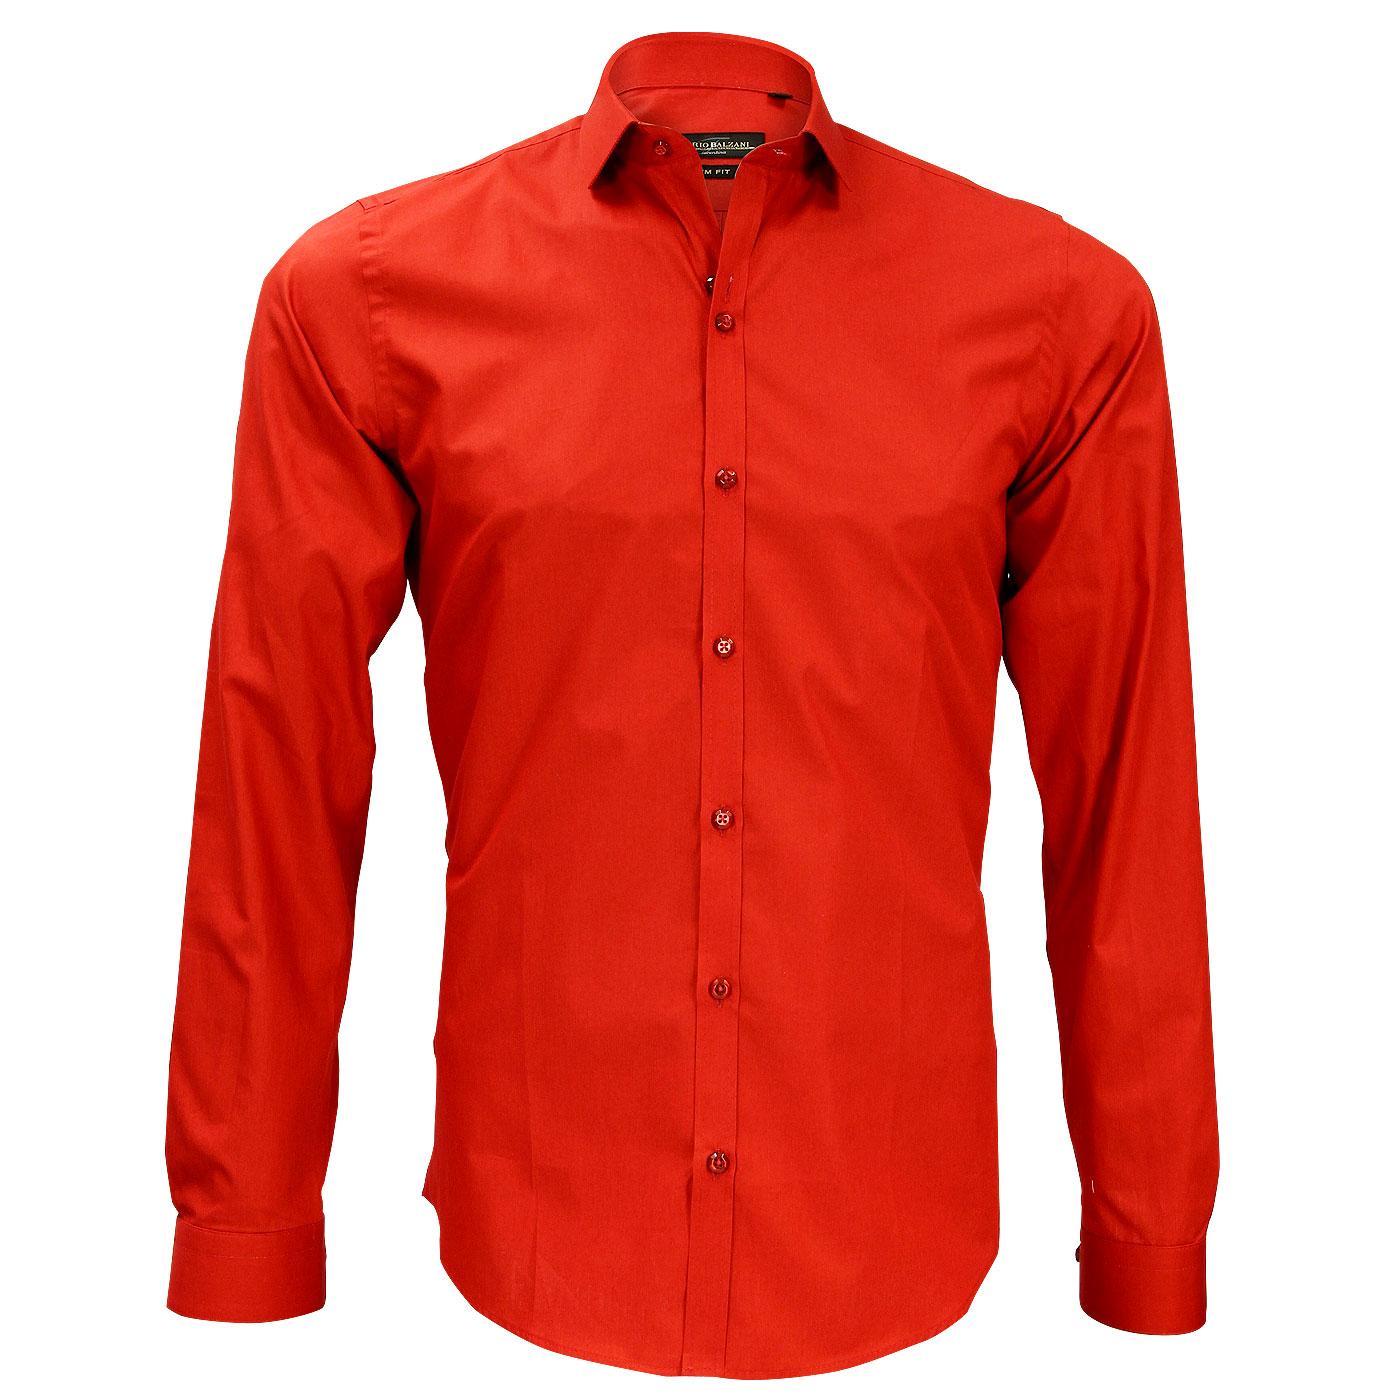 chemise rouge pour homme. Black Bedroom Furniture Sets. Home Design Ideas